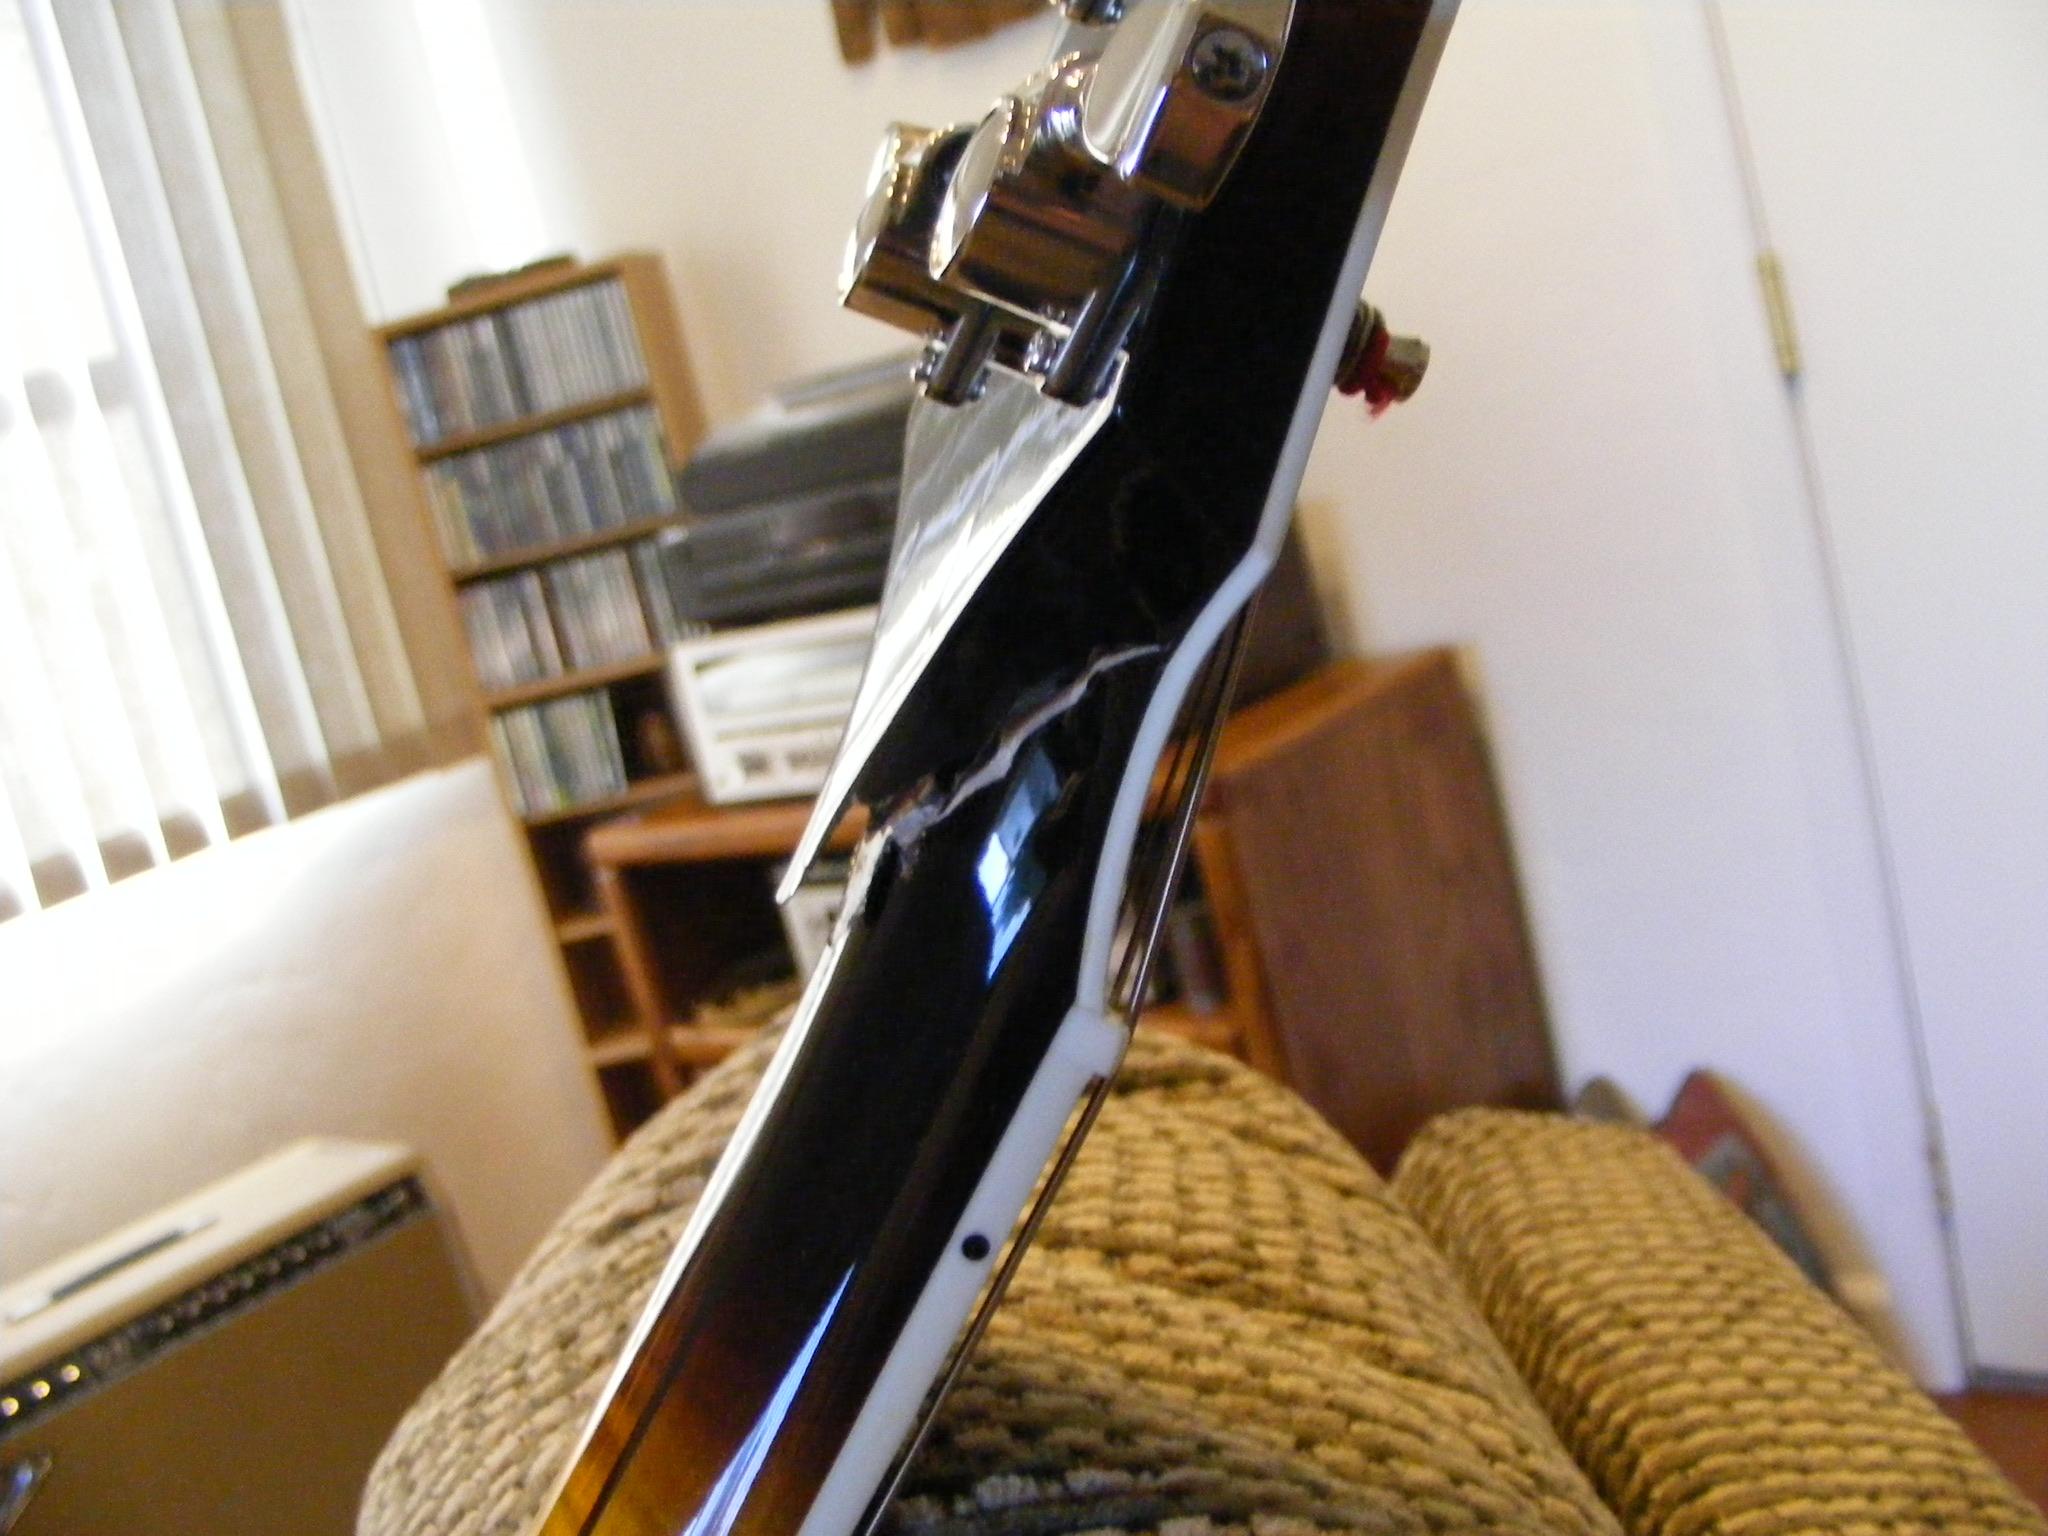 Gibson vs Campellone headstocks-9d028196-9dc1-44ad-b12b-1e544c9fa5ad-jpeg